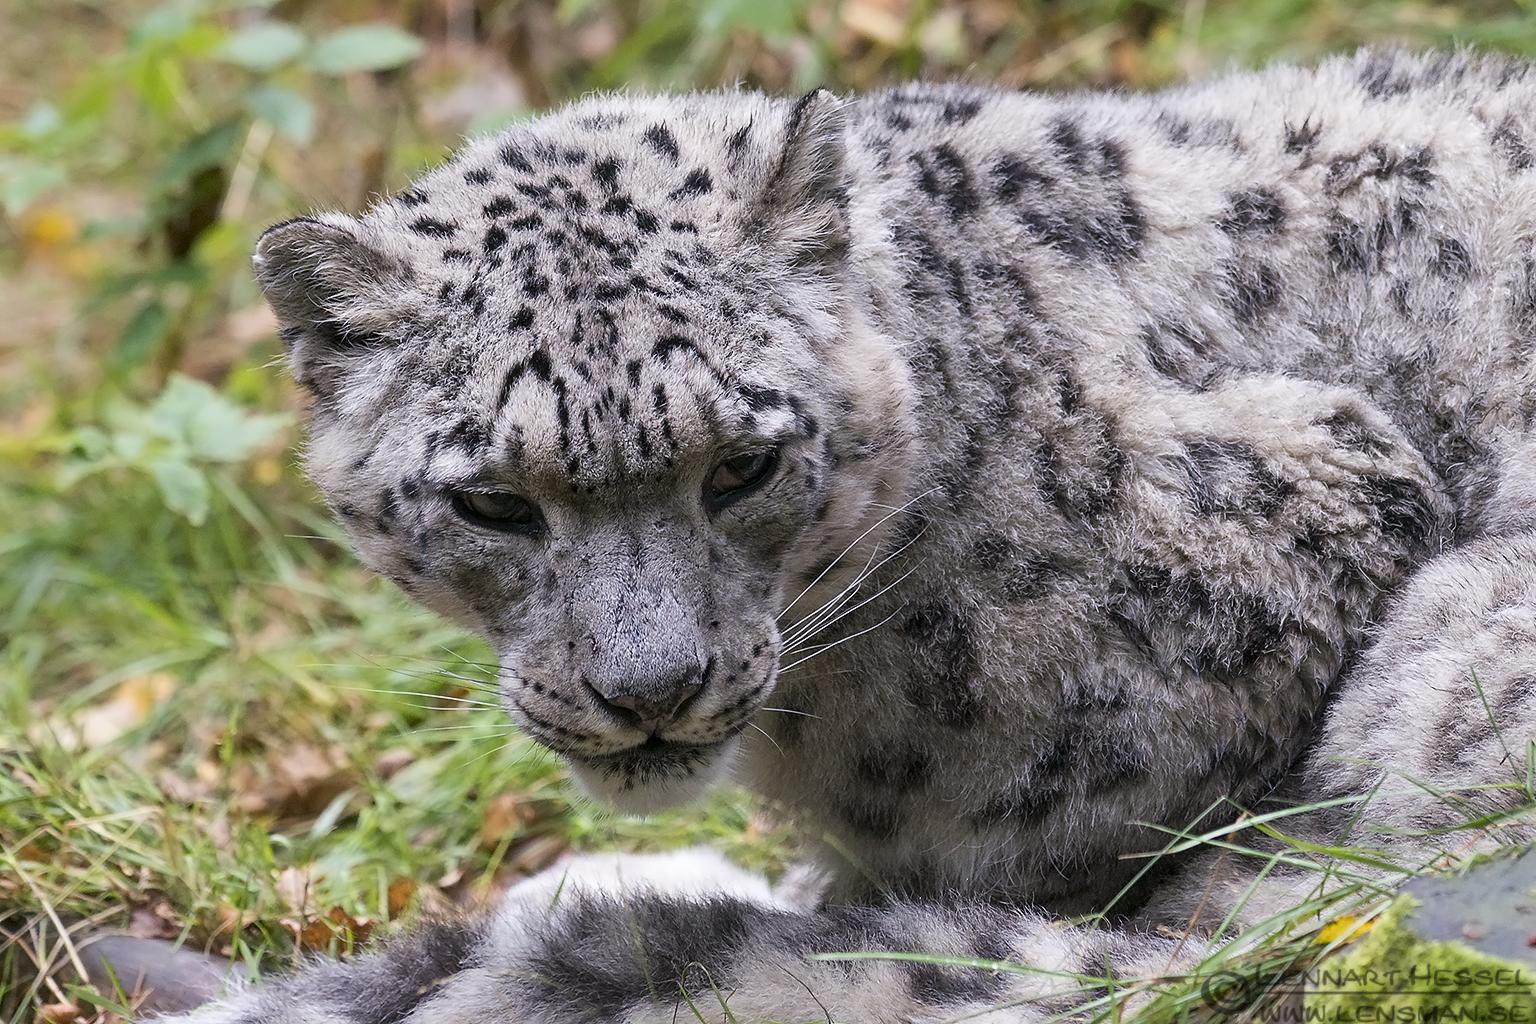 Snow leopard months